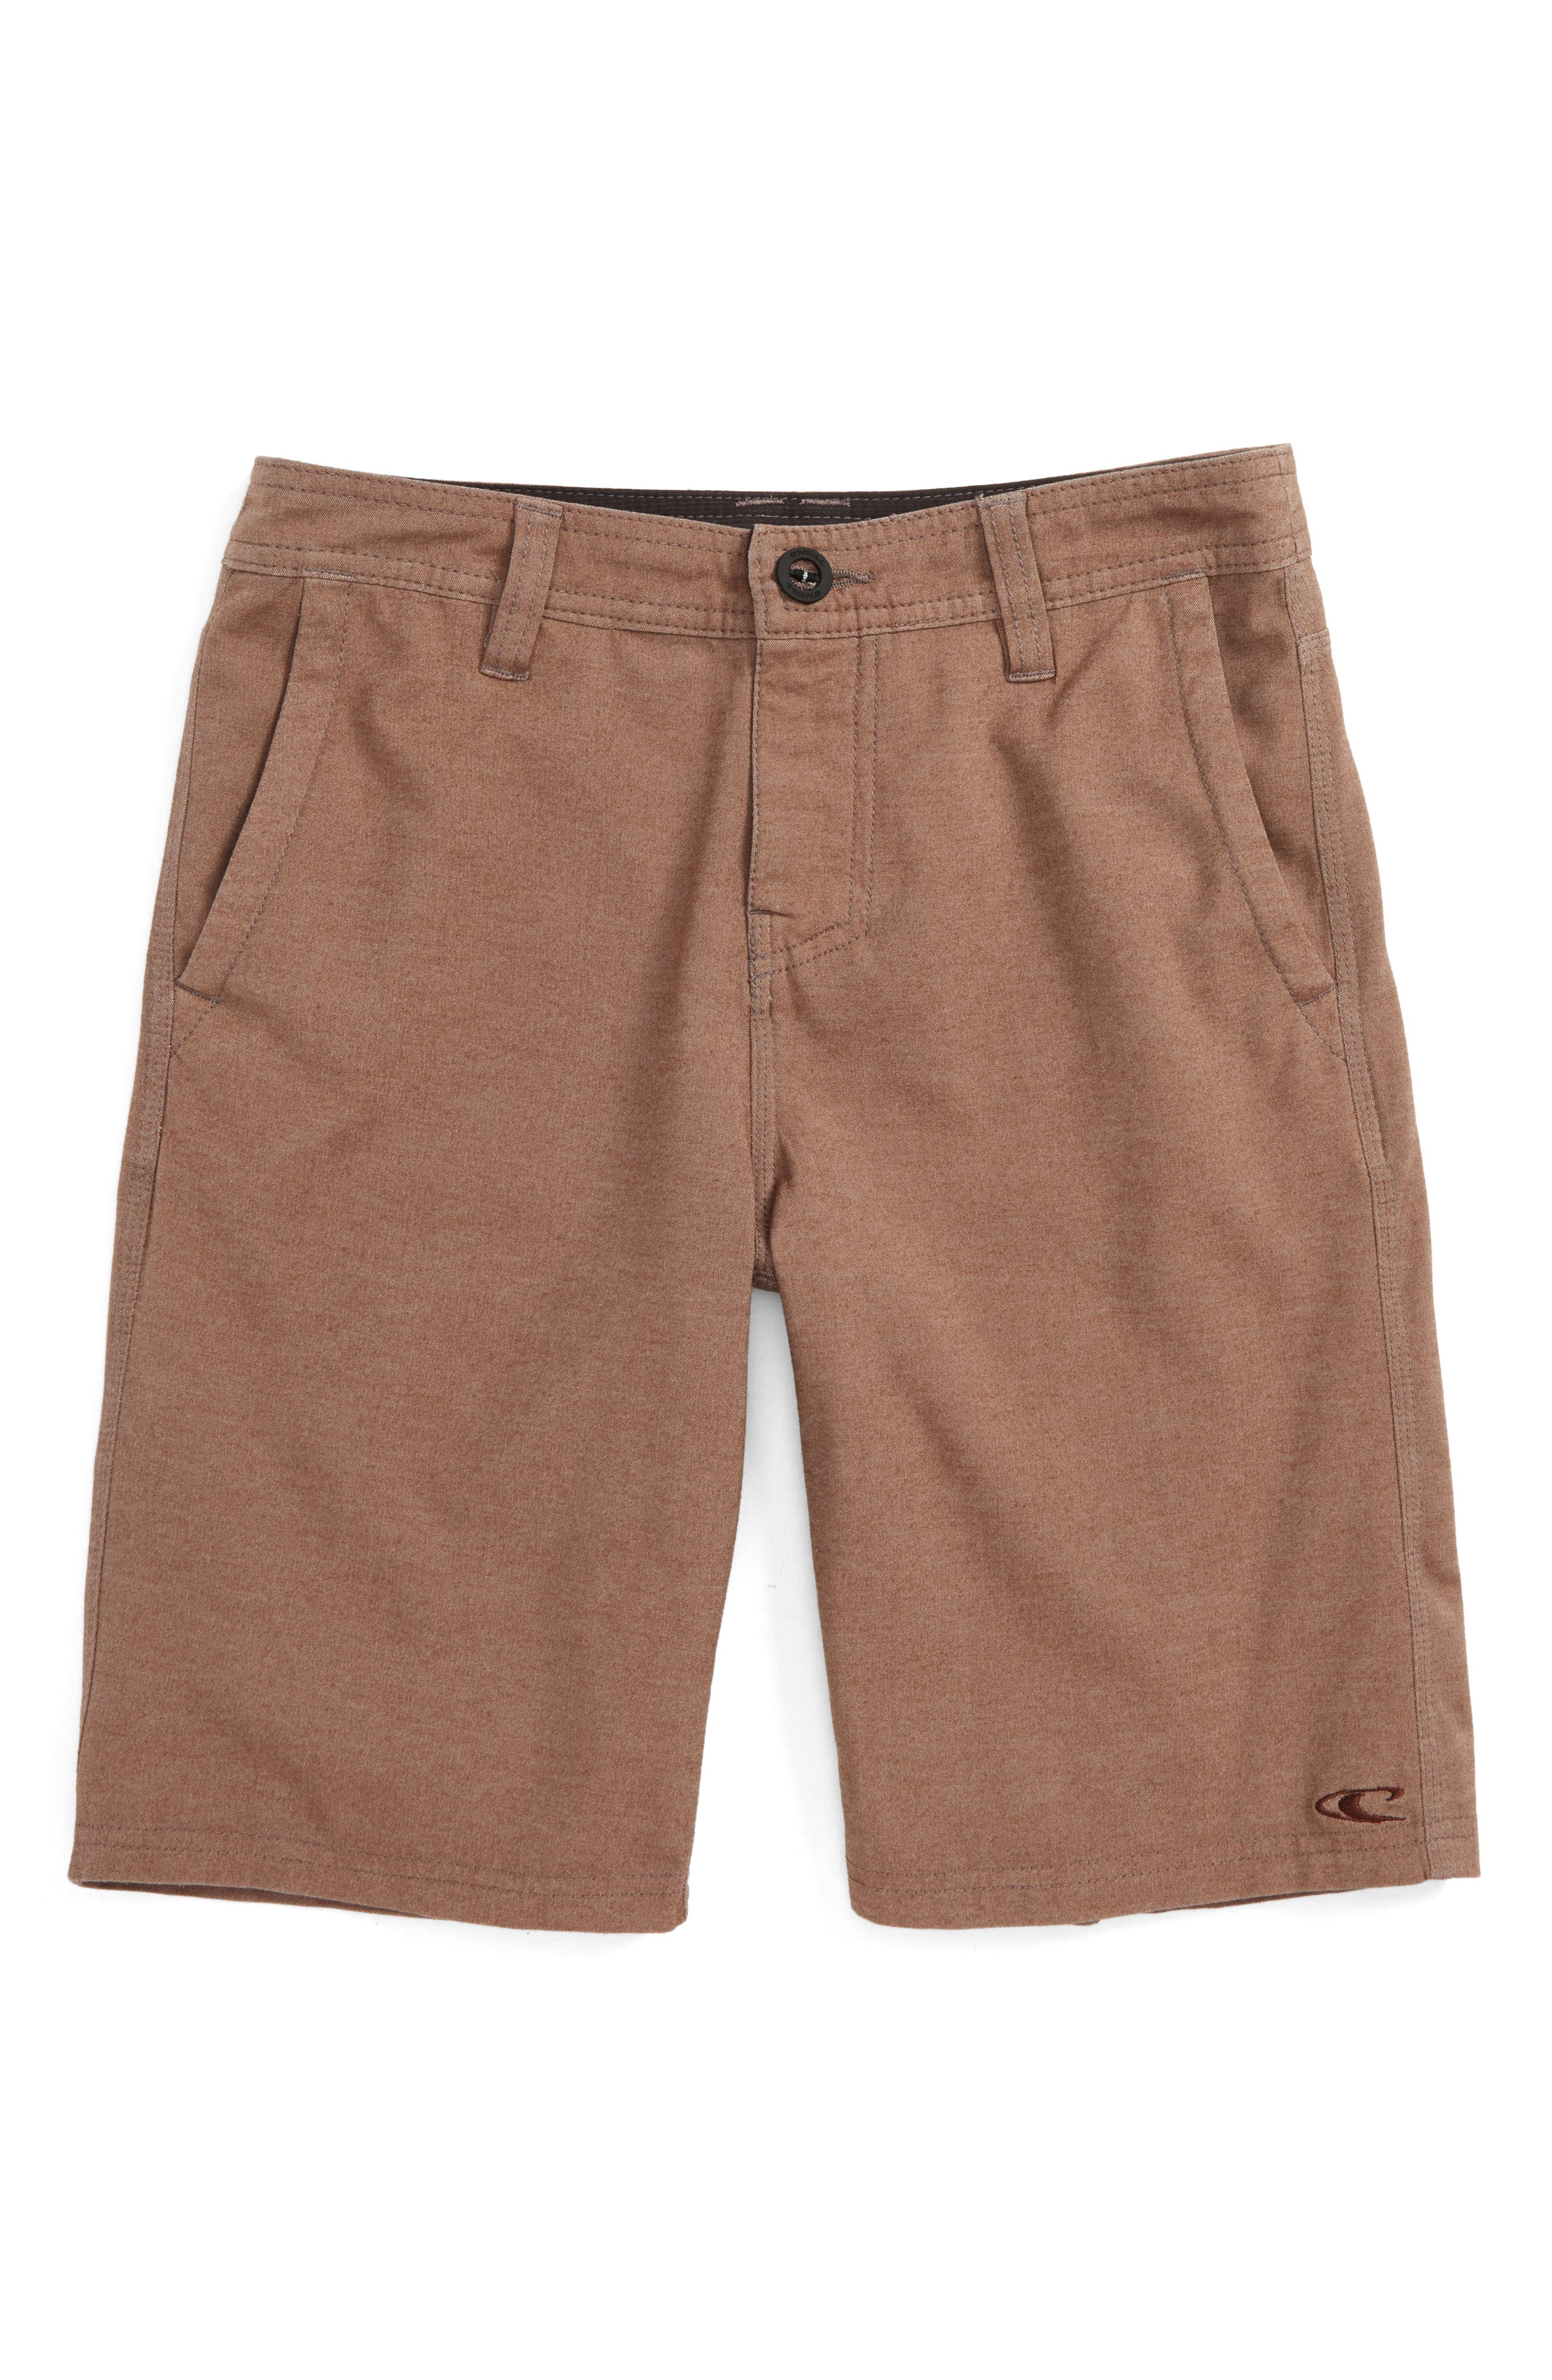 Locked Overdye Hybrid Shorts,                             Main thumbnail 1, color,